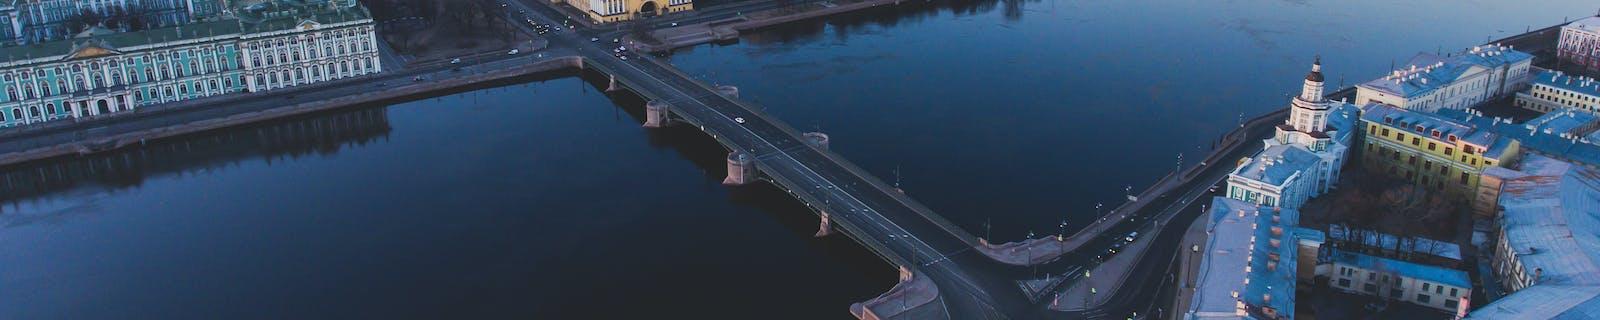 Cityscape of Saint-Petersburg City